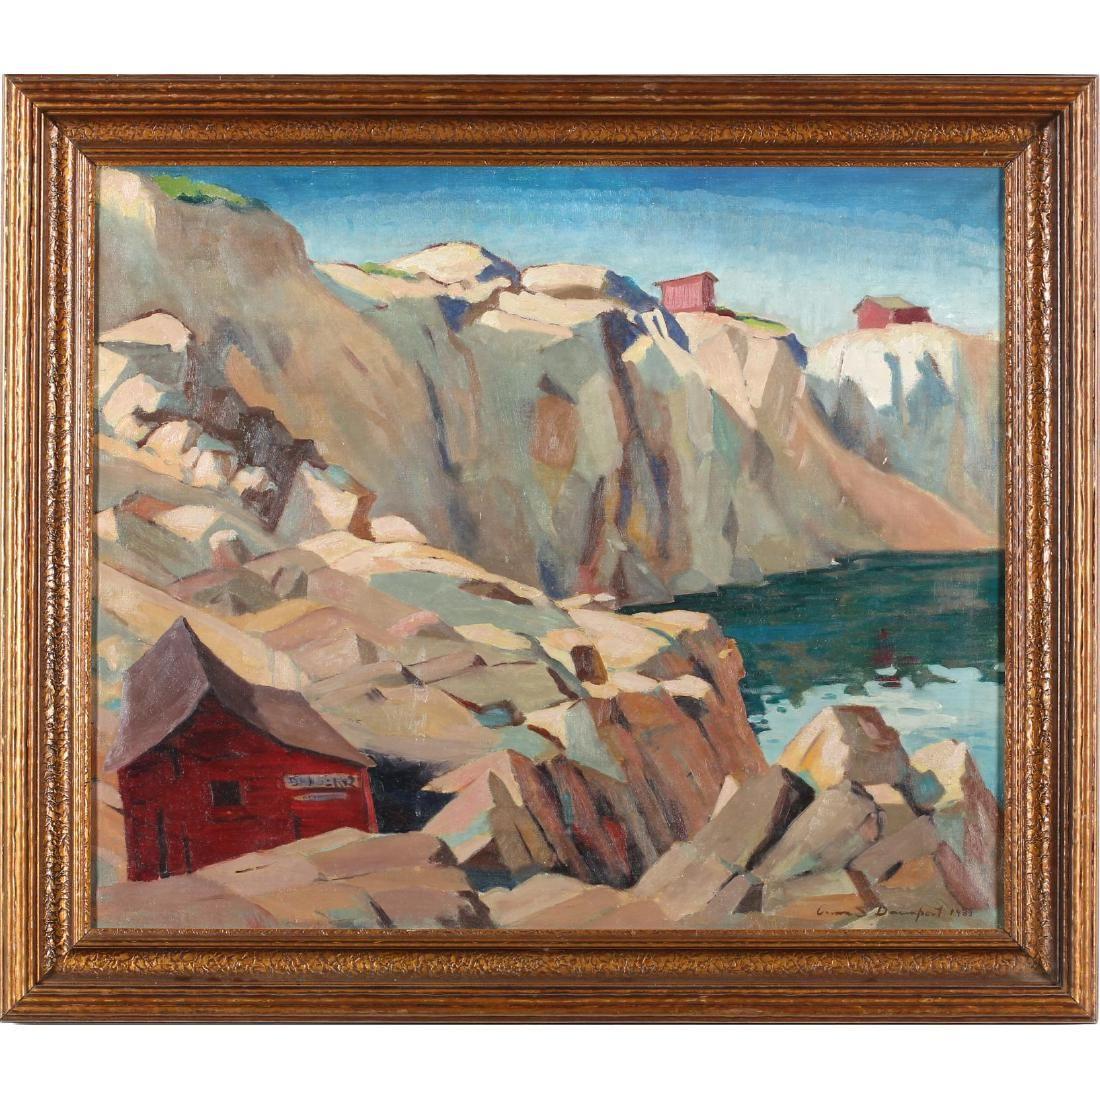 Carson Davenport (VA, 1908-1972), Marble Quarry